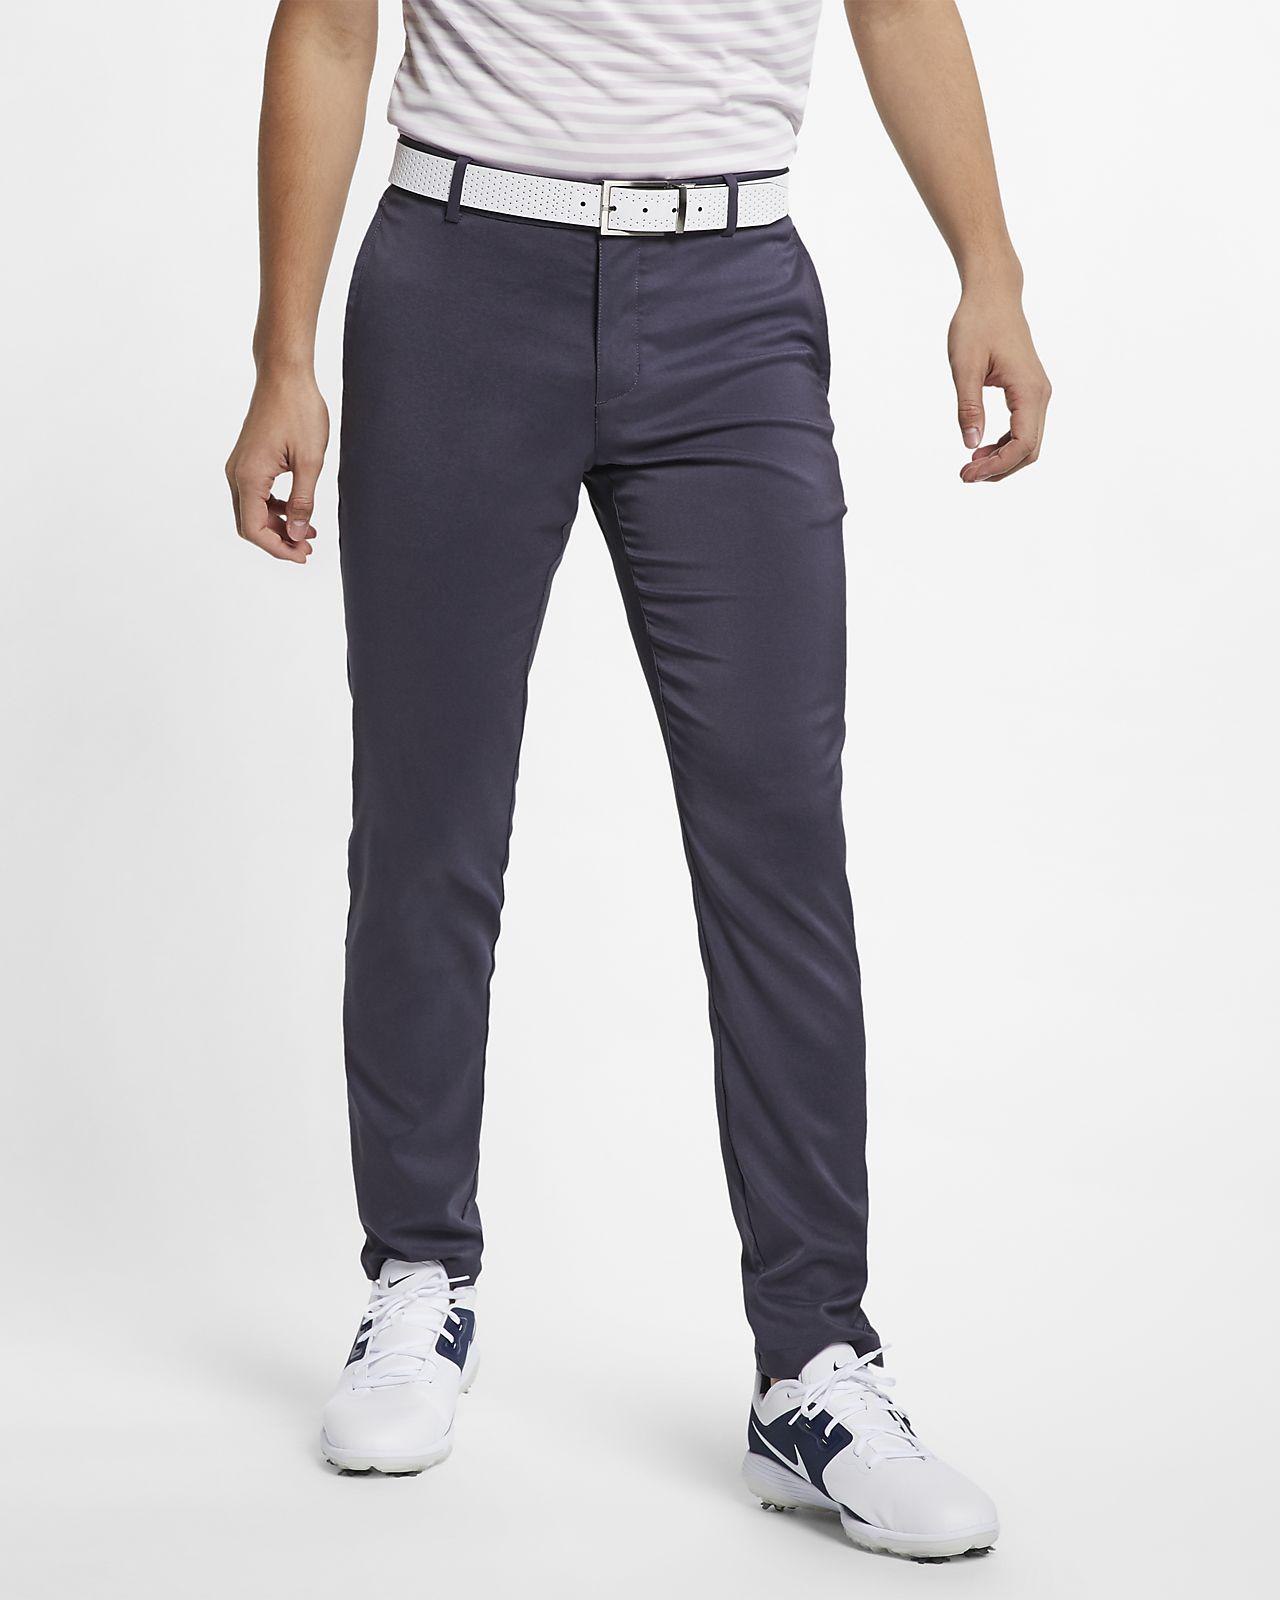 Nike Flex Pantalons de golf amb ajust entallat - Home